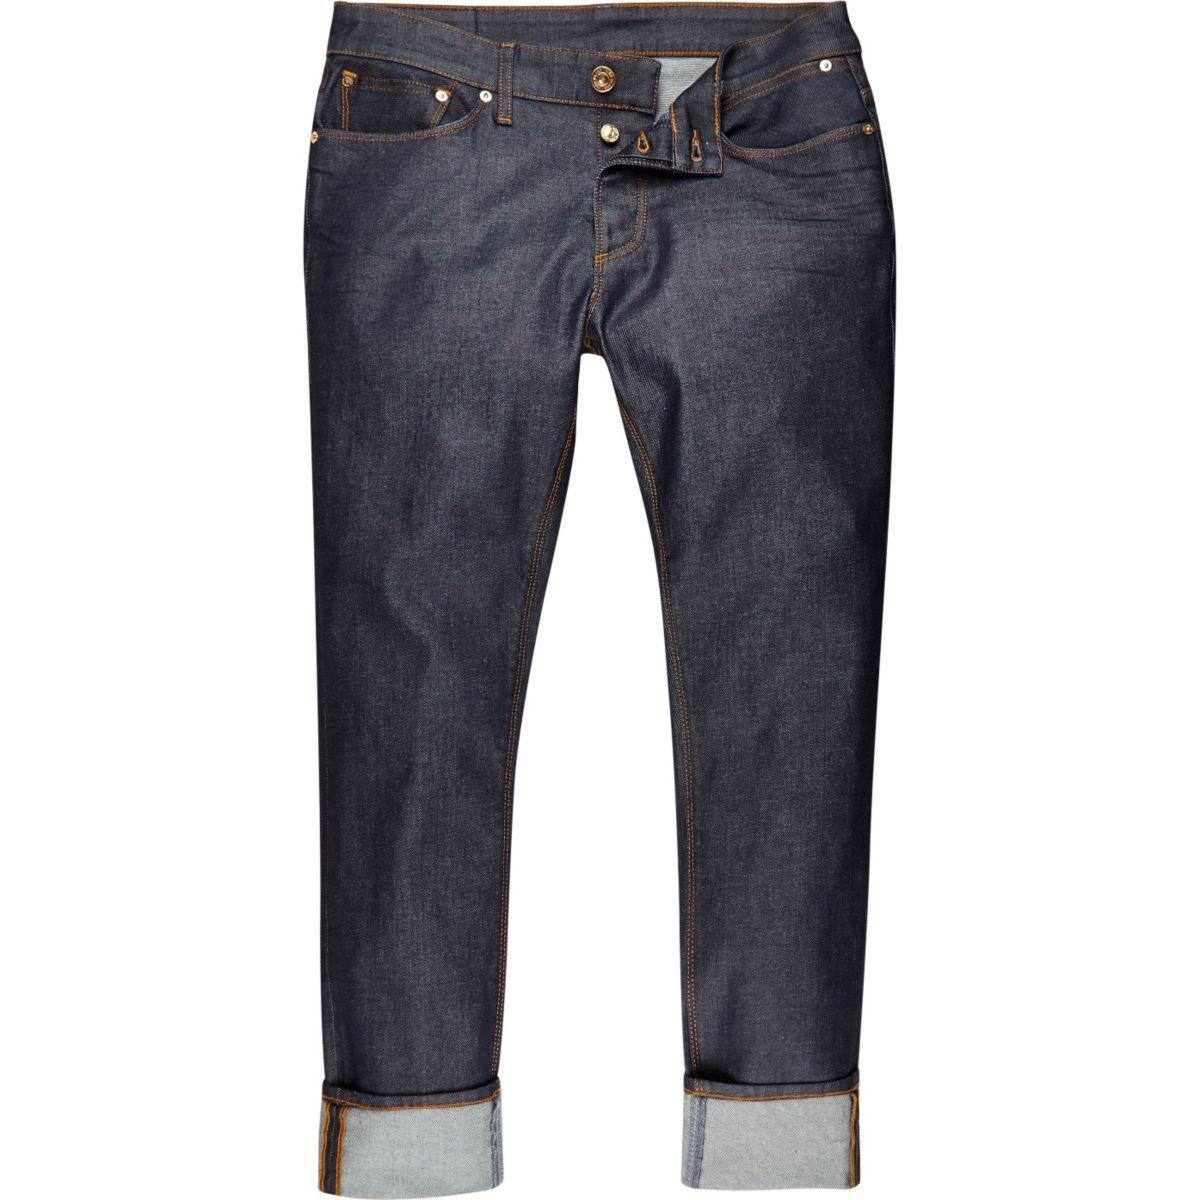 Dark blue wash Dylan slim turn-up jeans